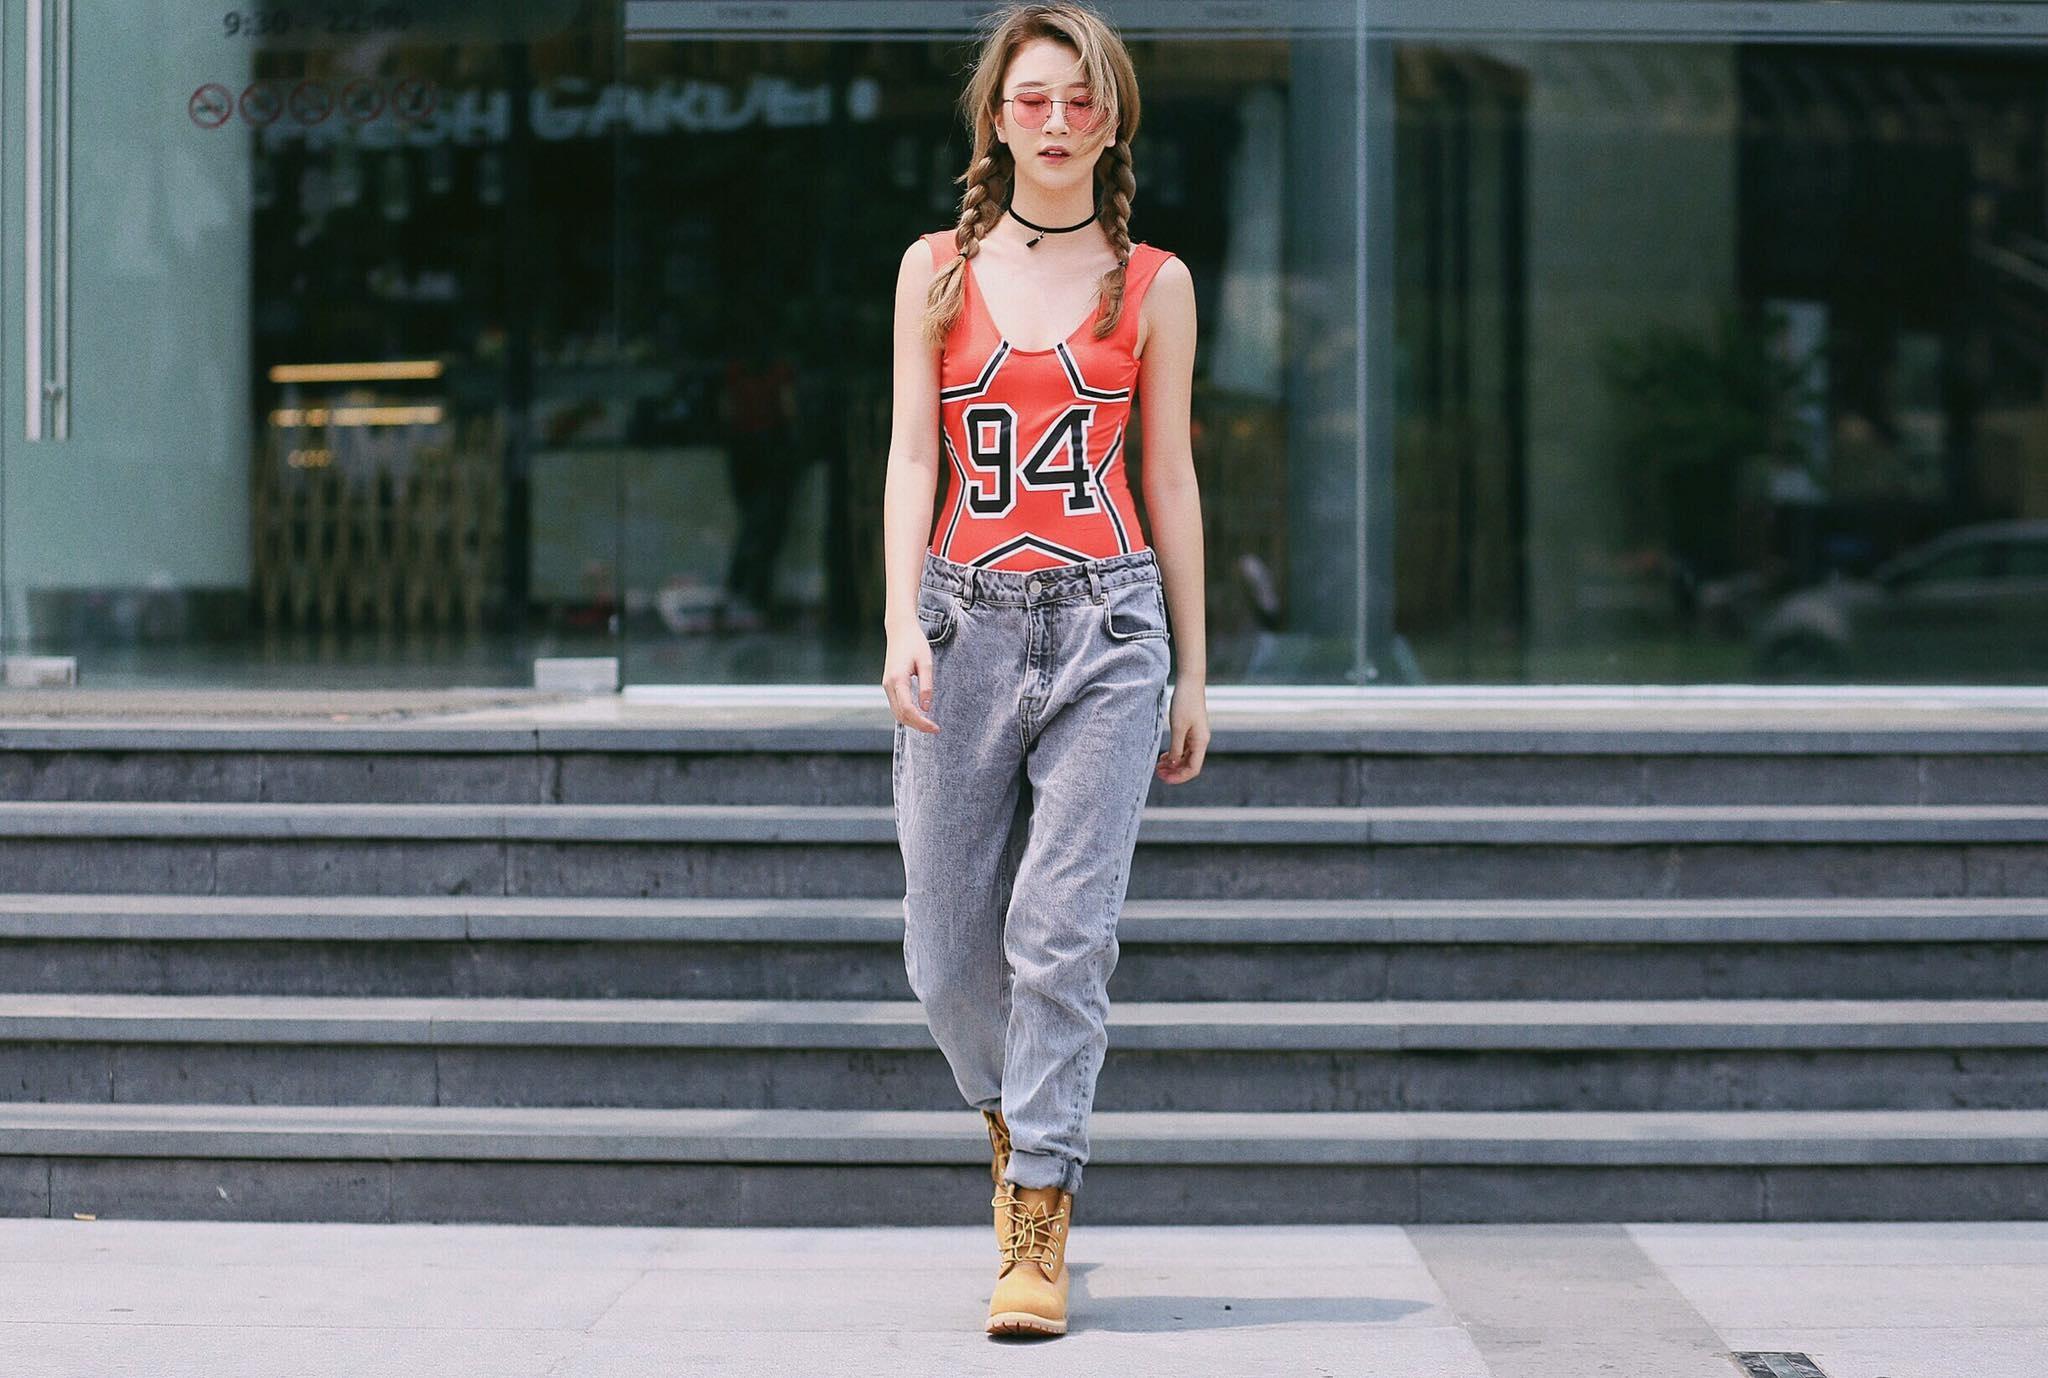 Quynh Anh Shyn - tu hot girl Ha thanh den fashionista co style doc la hinh anh 8 QAS7.jpg